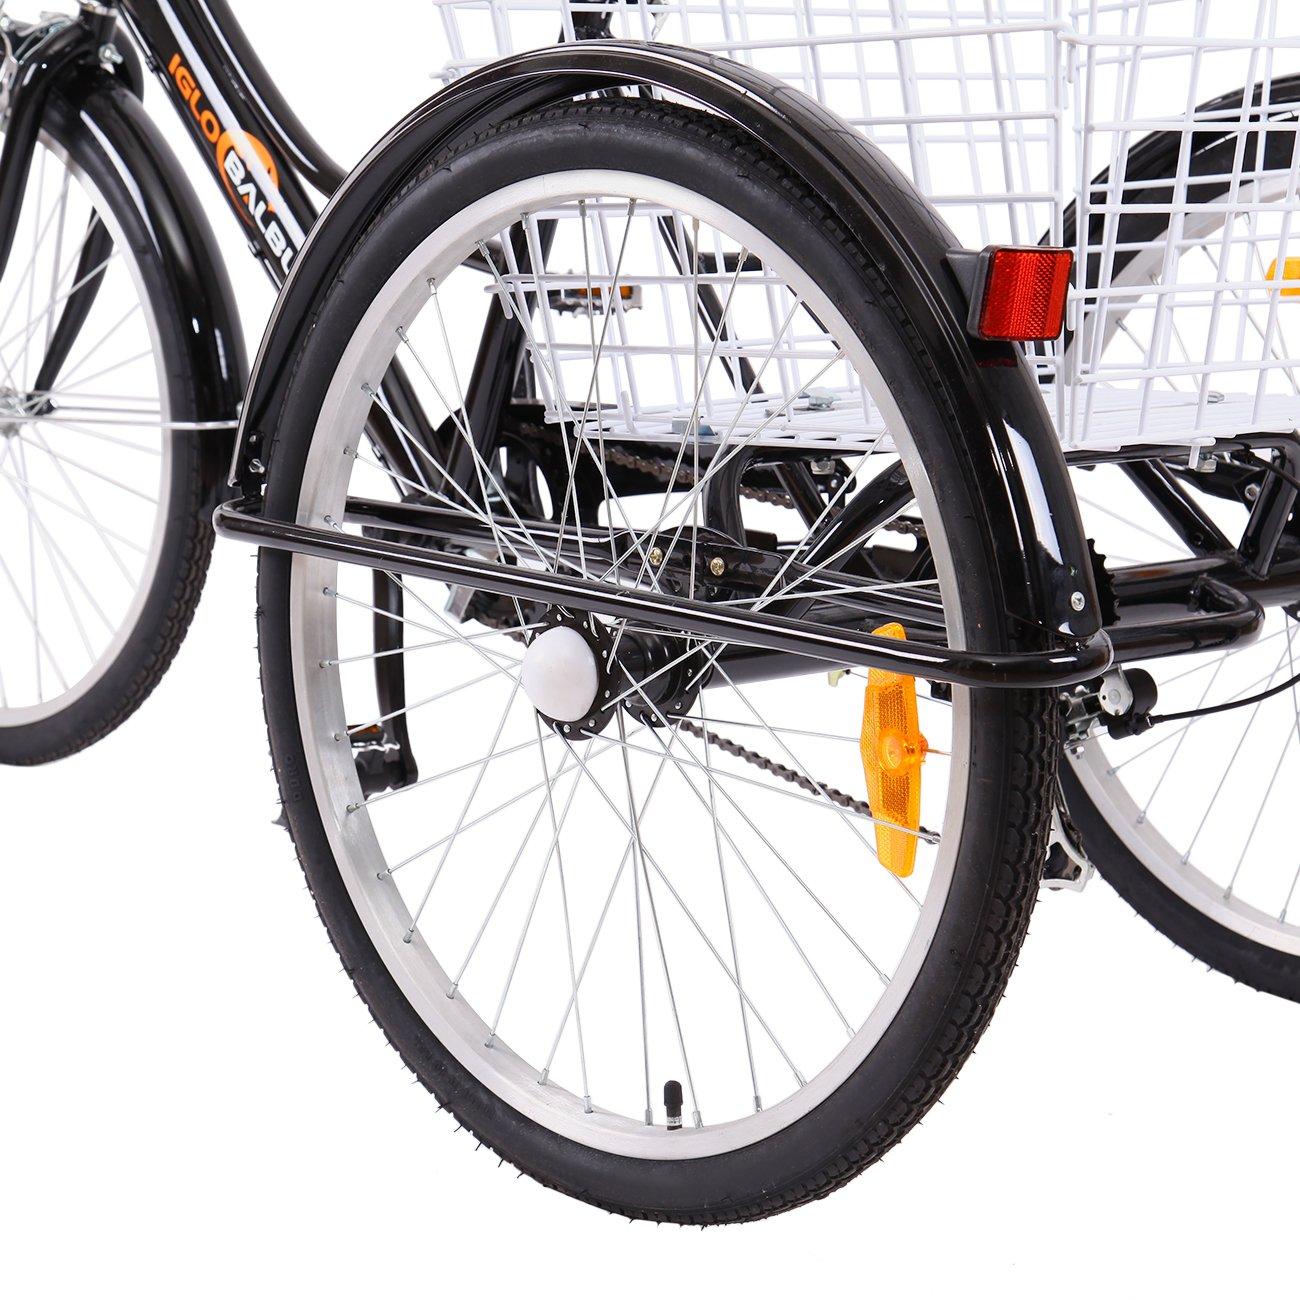 Yonntech Triciclo per Adulti 07